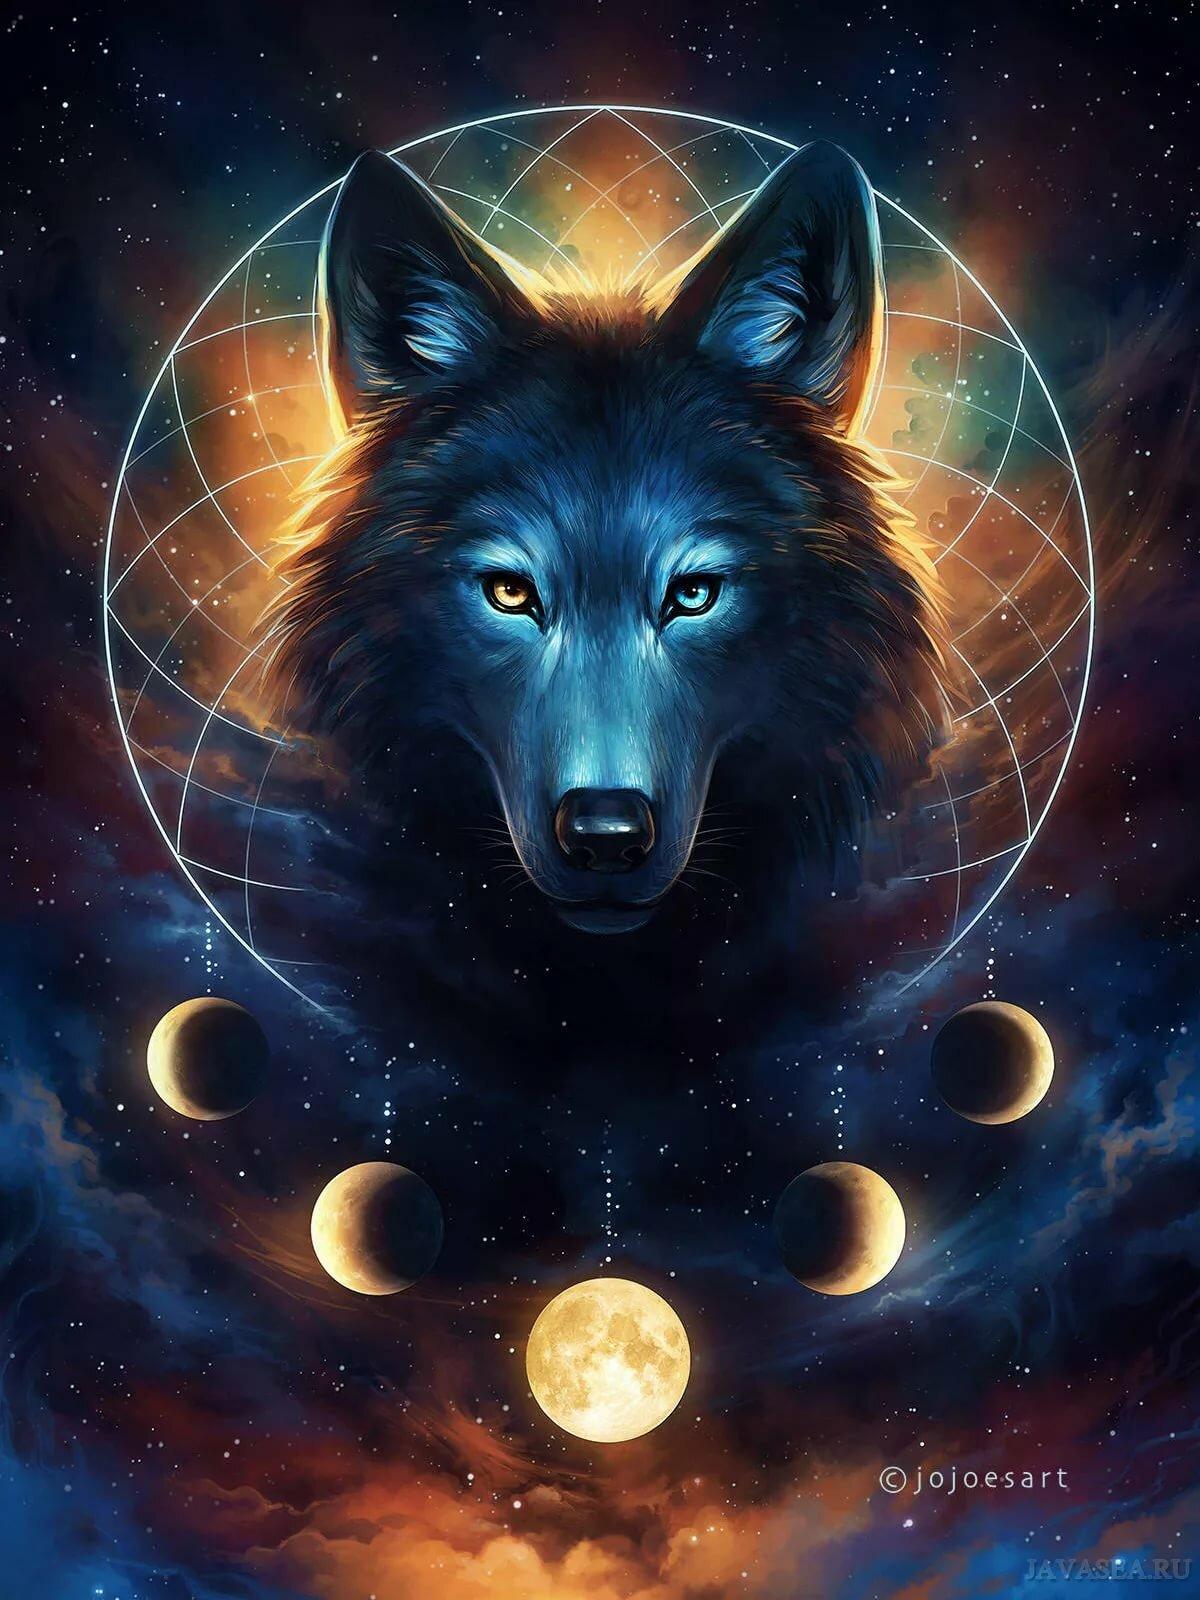 крутой волк в картинках пизды чулках